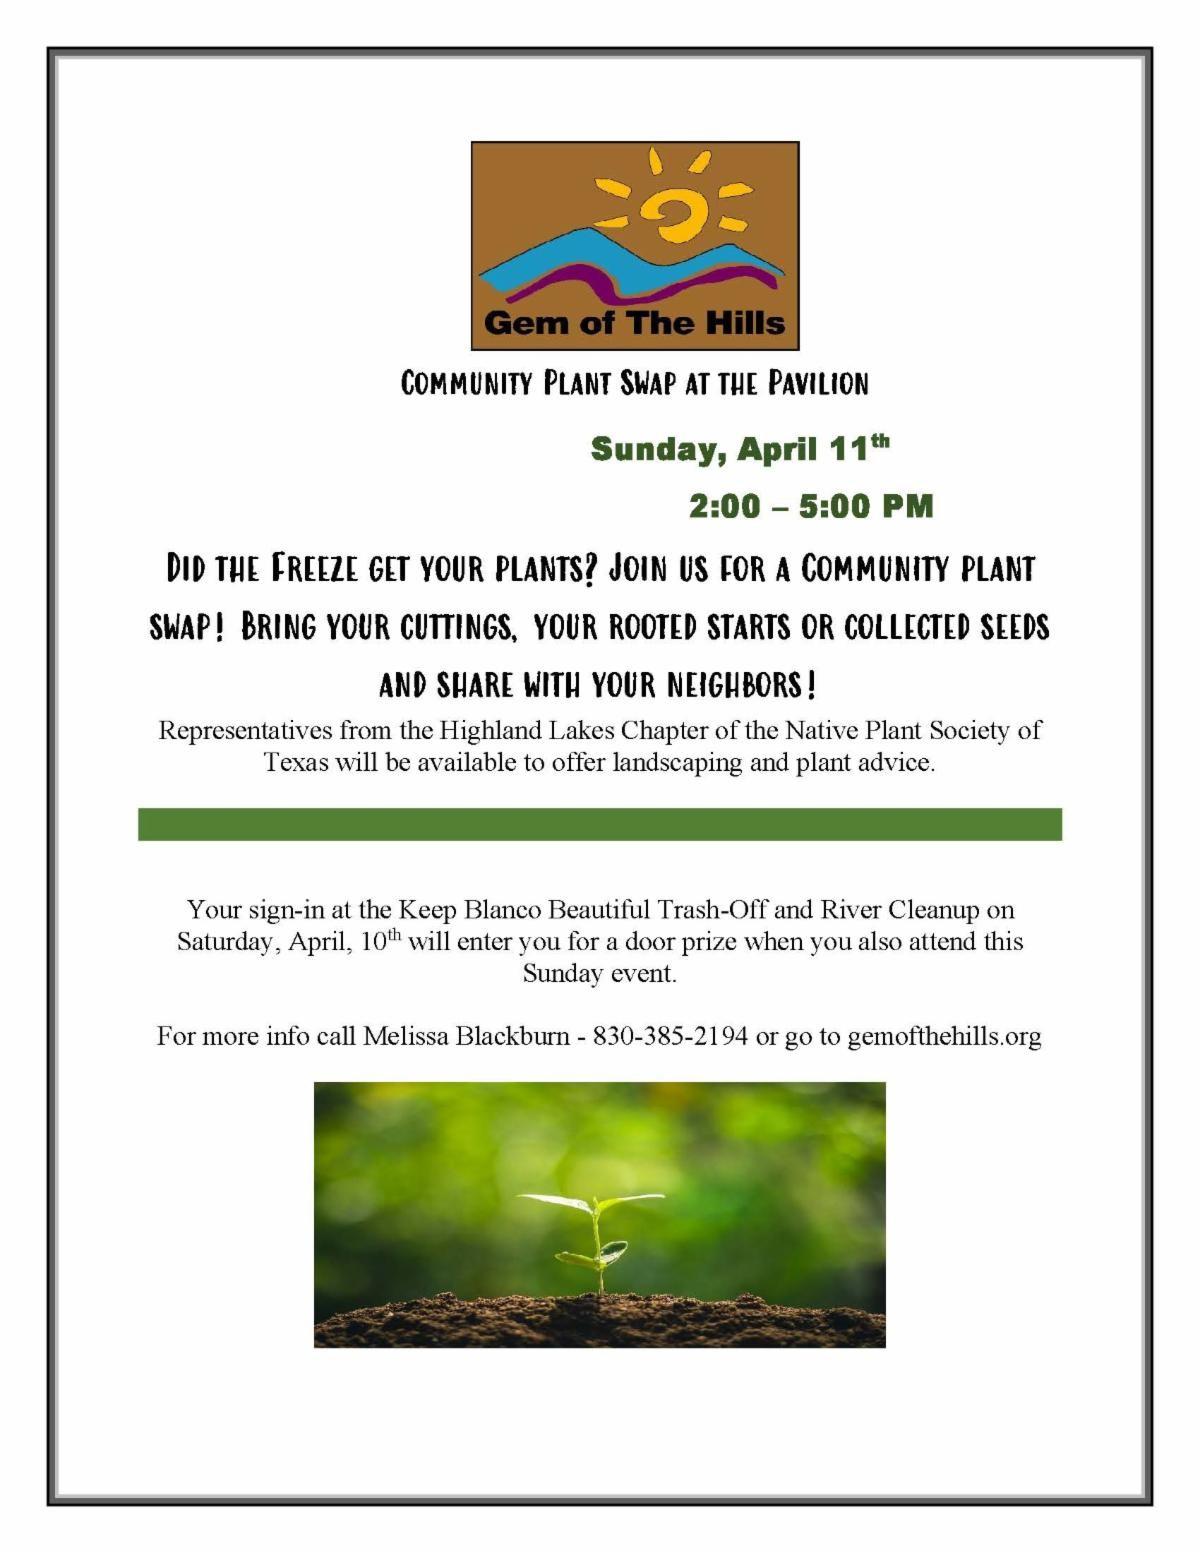 Community Plant Swap